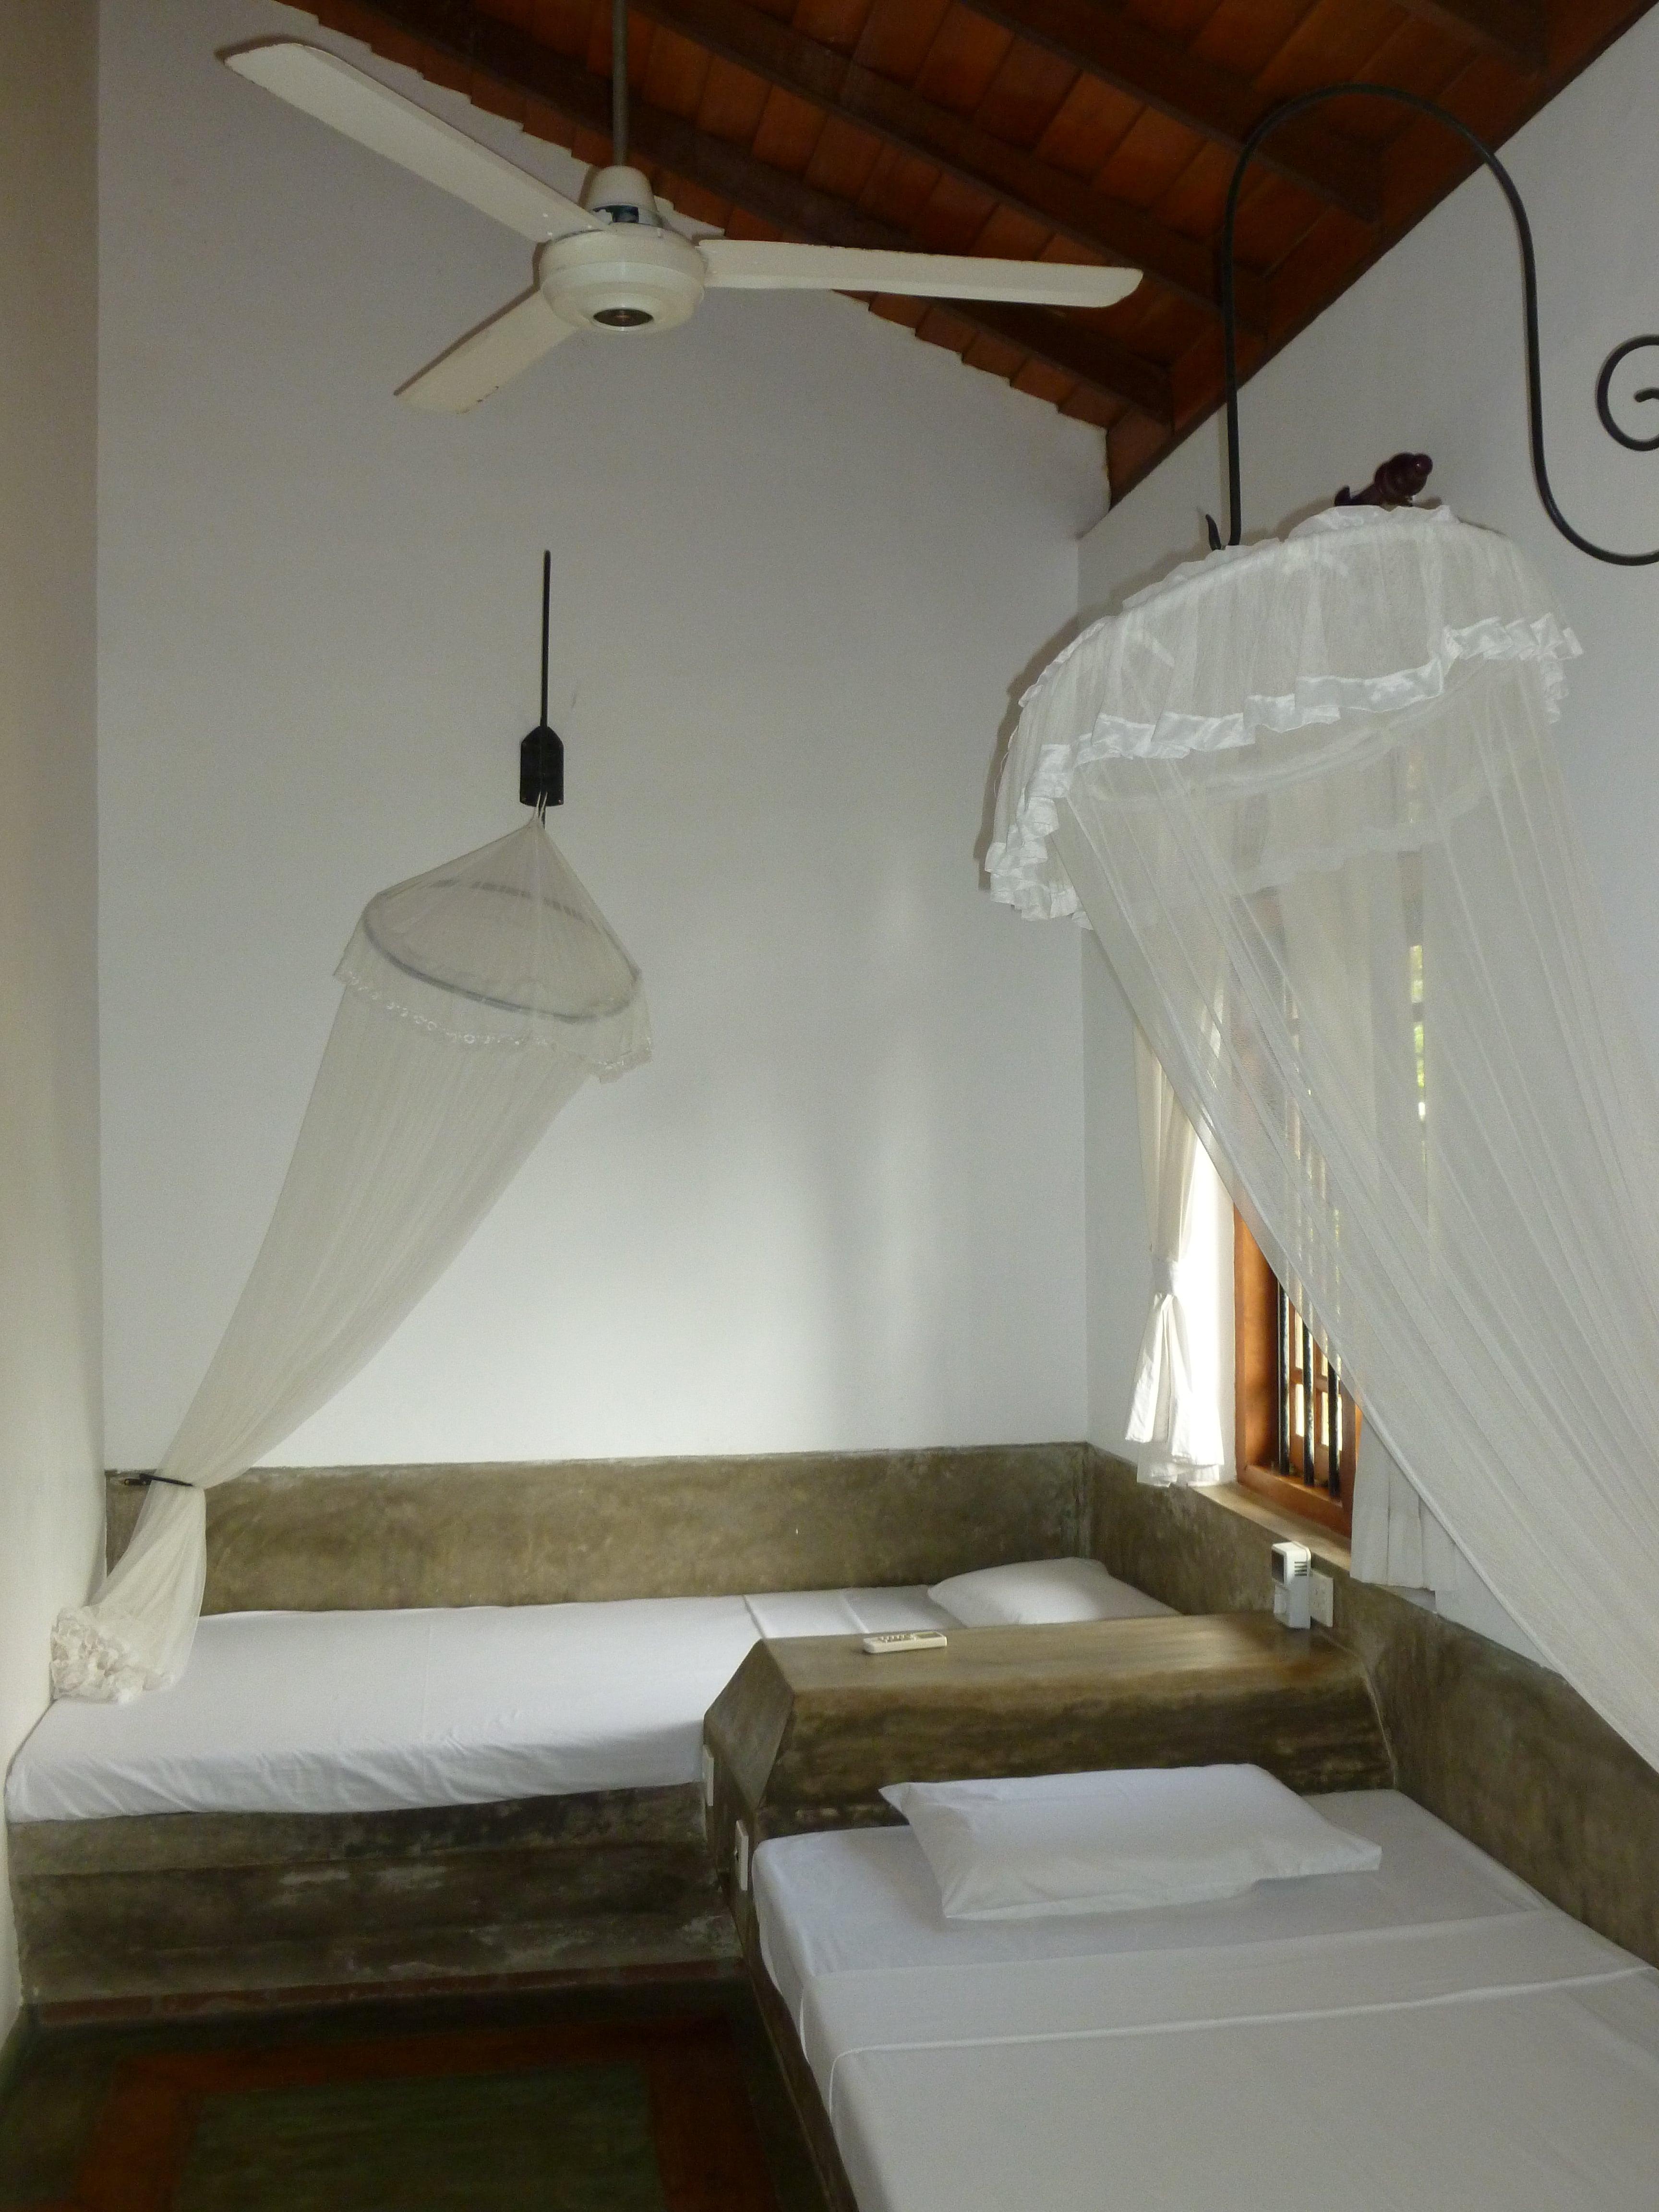 villaaraliya-apartment-beds